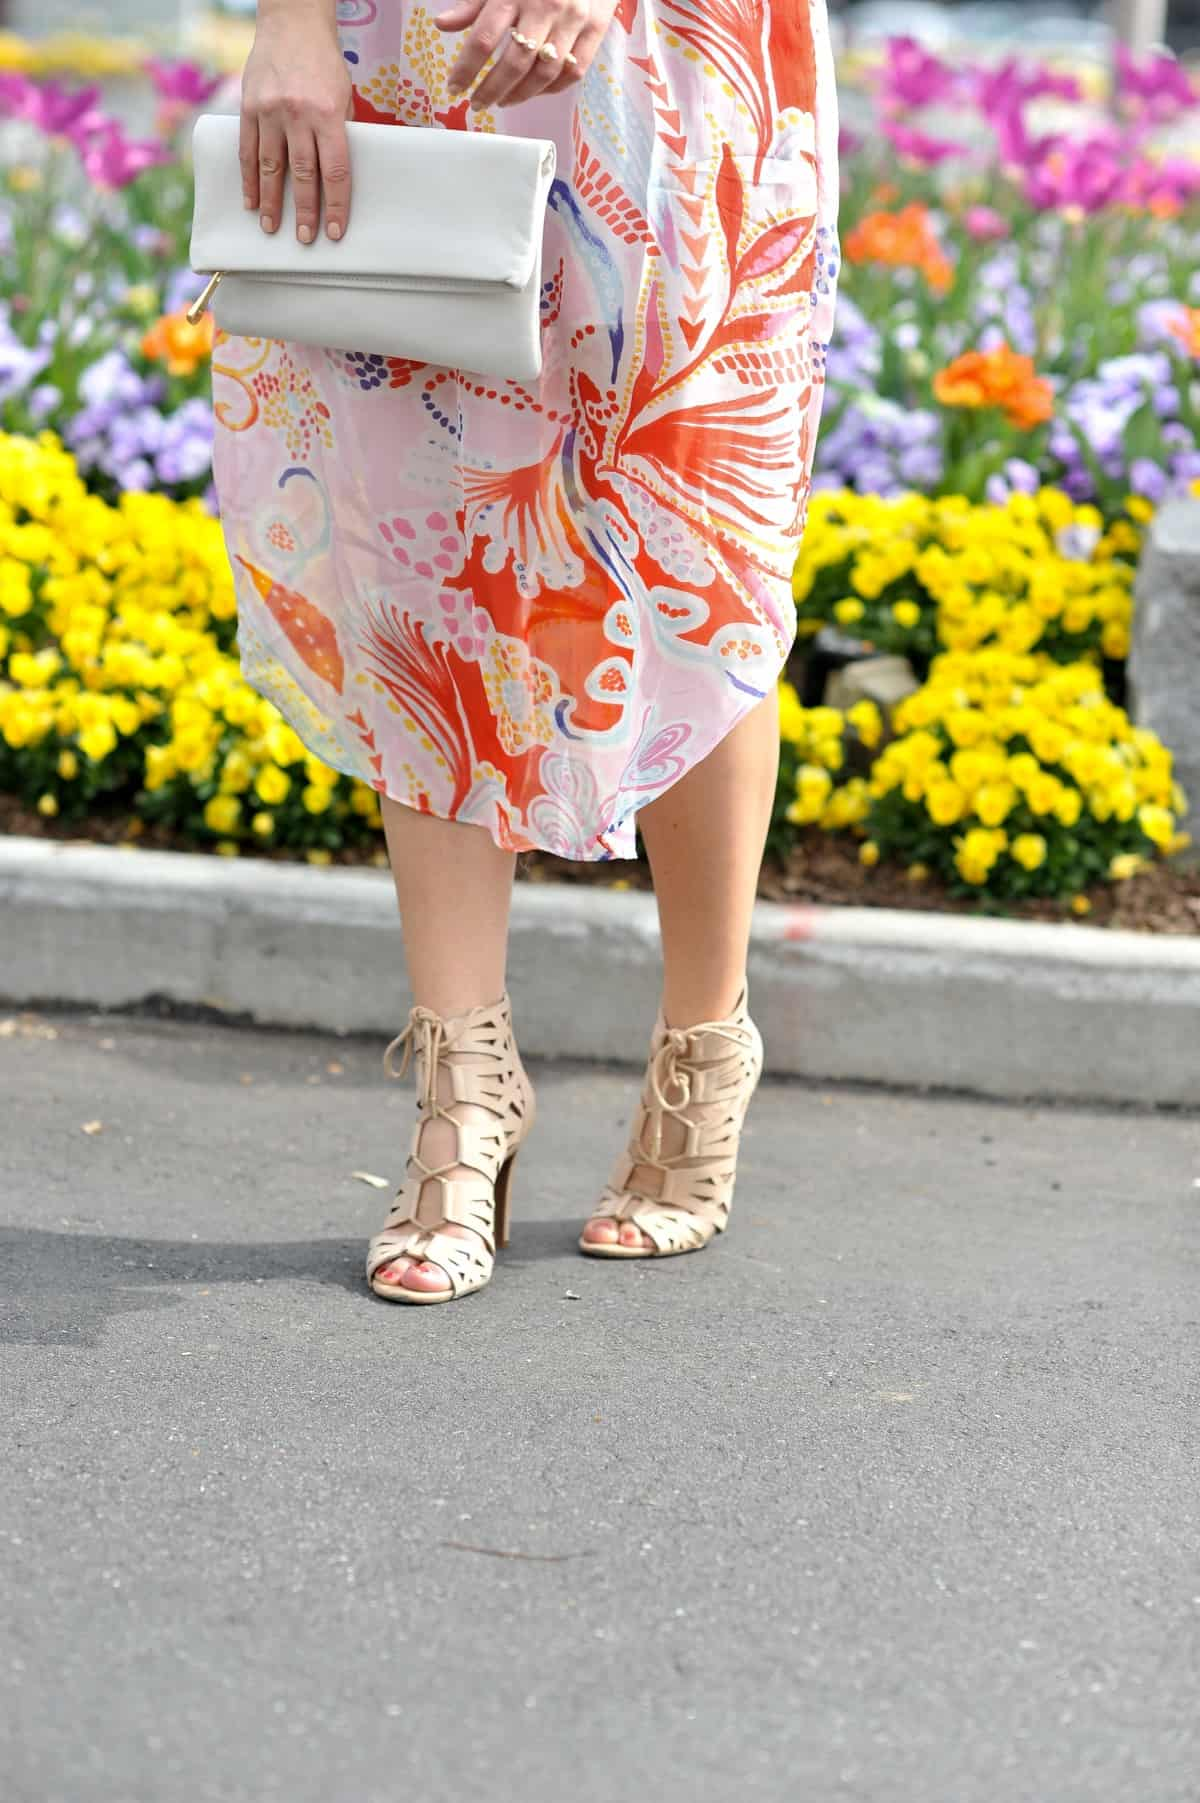 Banjanan Cochella Dress - printed floral dress for summer - My Style Vita - @mystylevita - 12